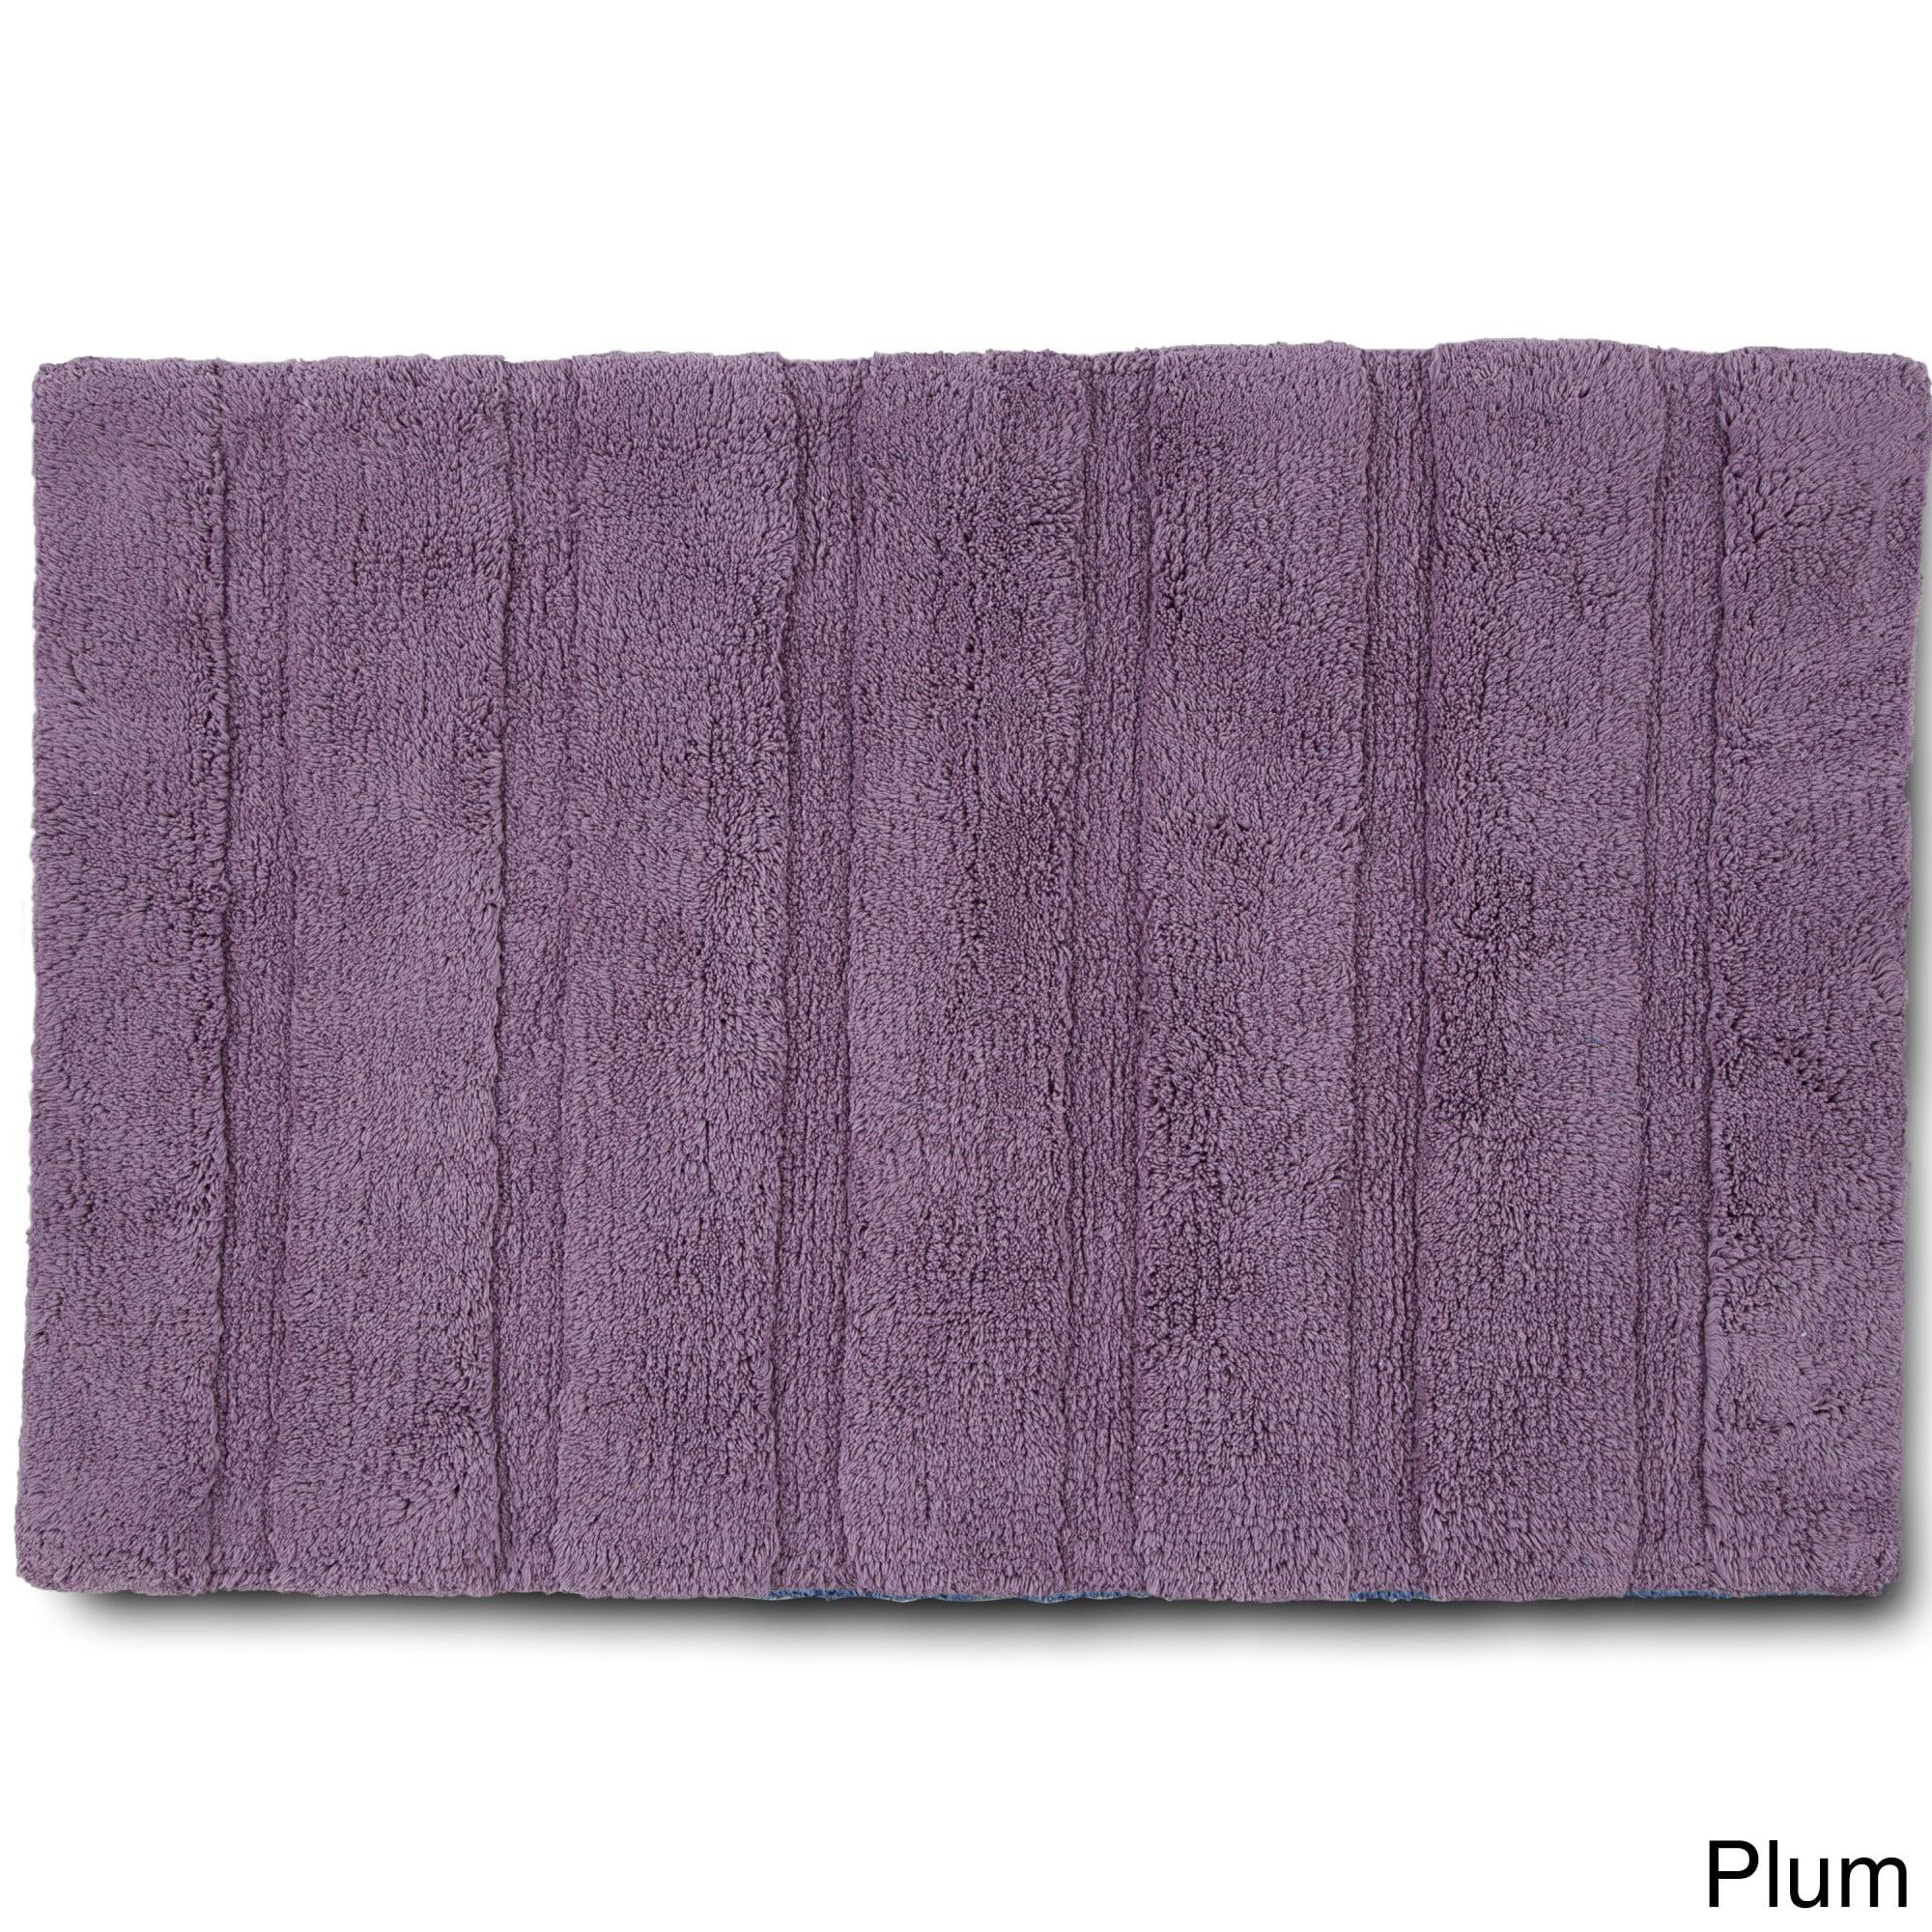 bathrooms bathroom rugs mat l mats red bath purple square design